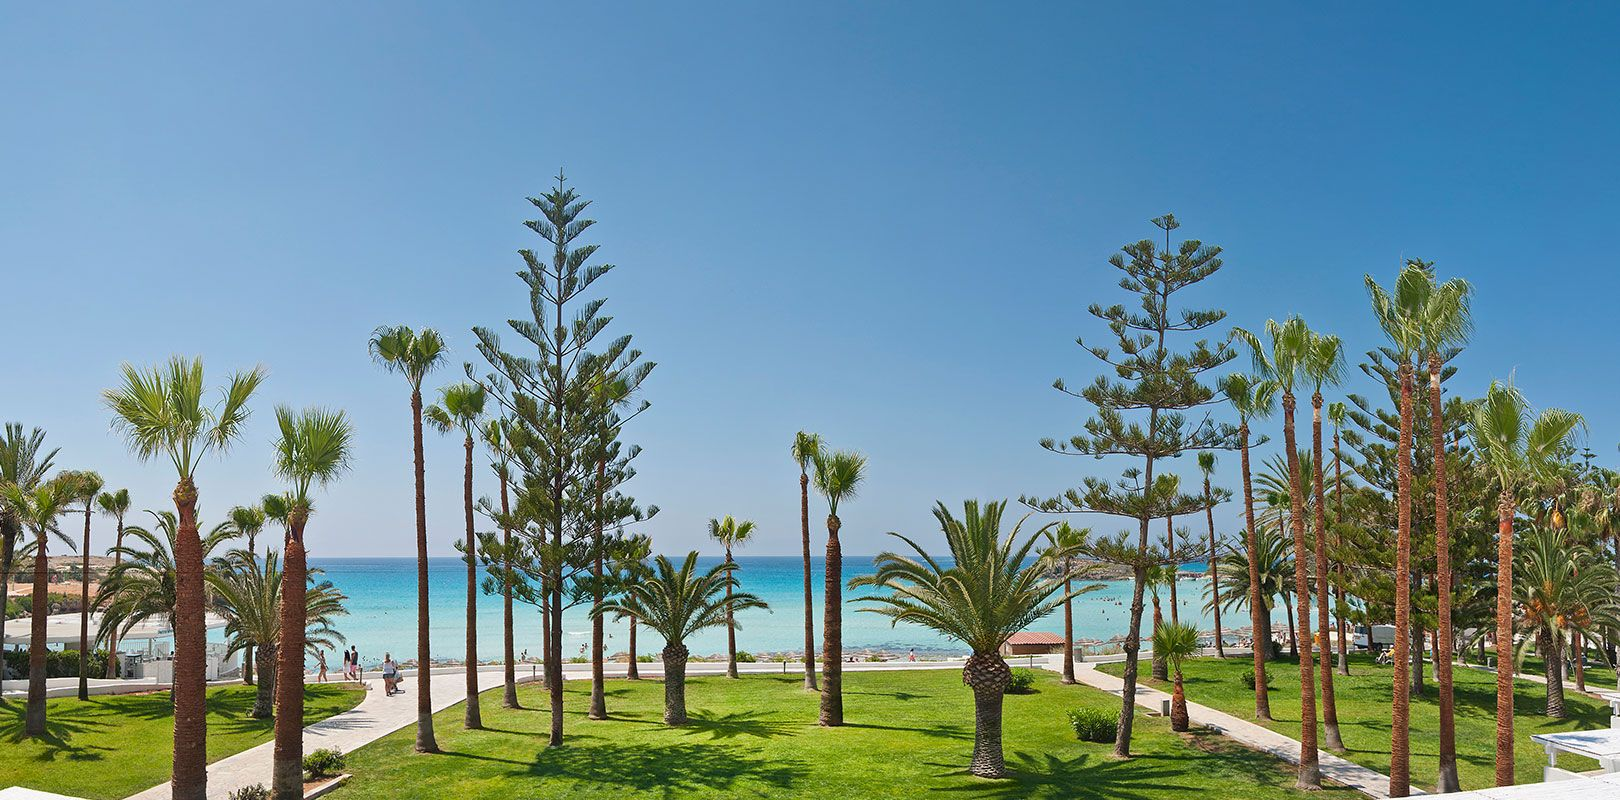 Gallerie Nissi Beach Resort Ayia Napa Zypern Places I